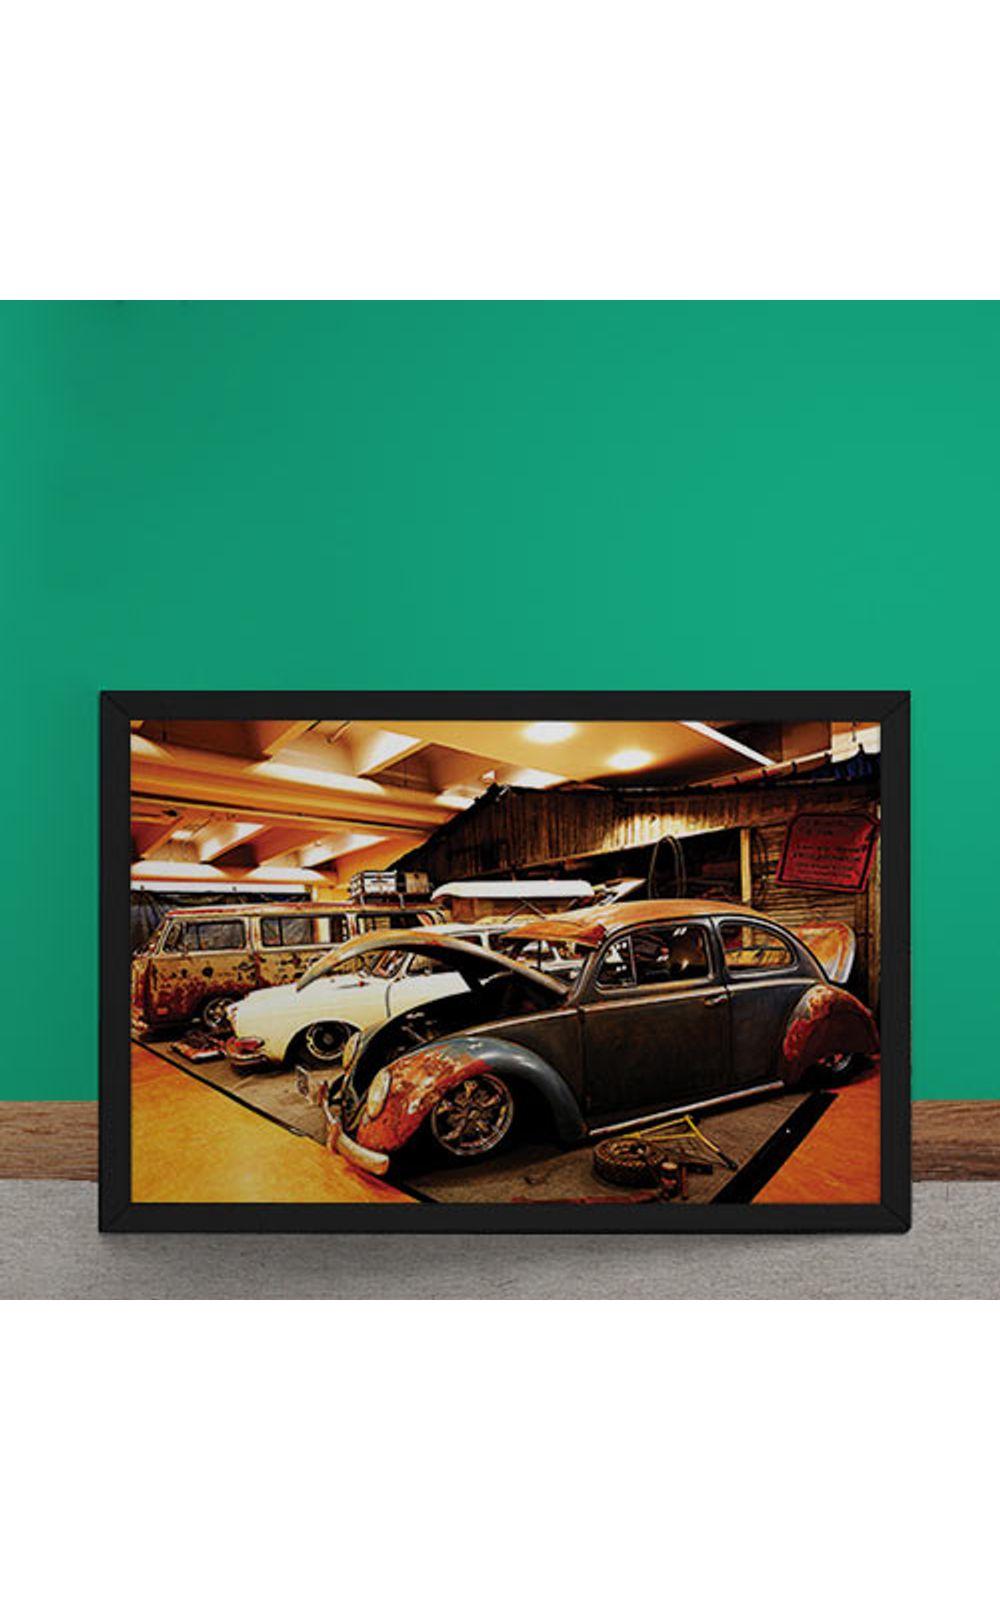 Foto 2 - Quadro Decorativo Carro Volkswagen Rat Look